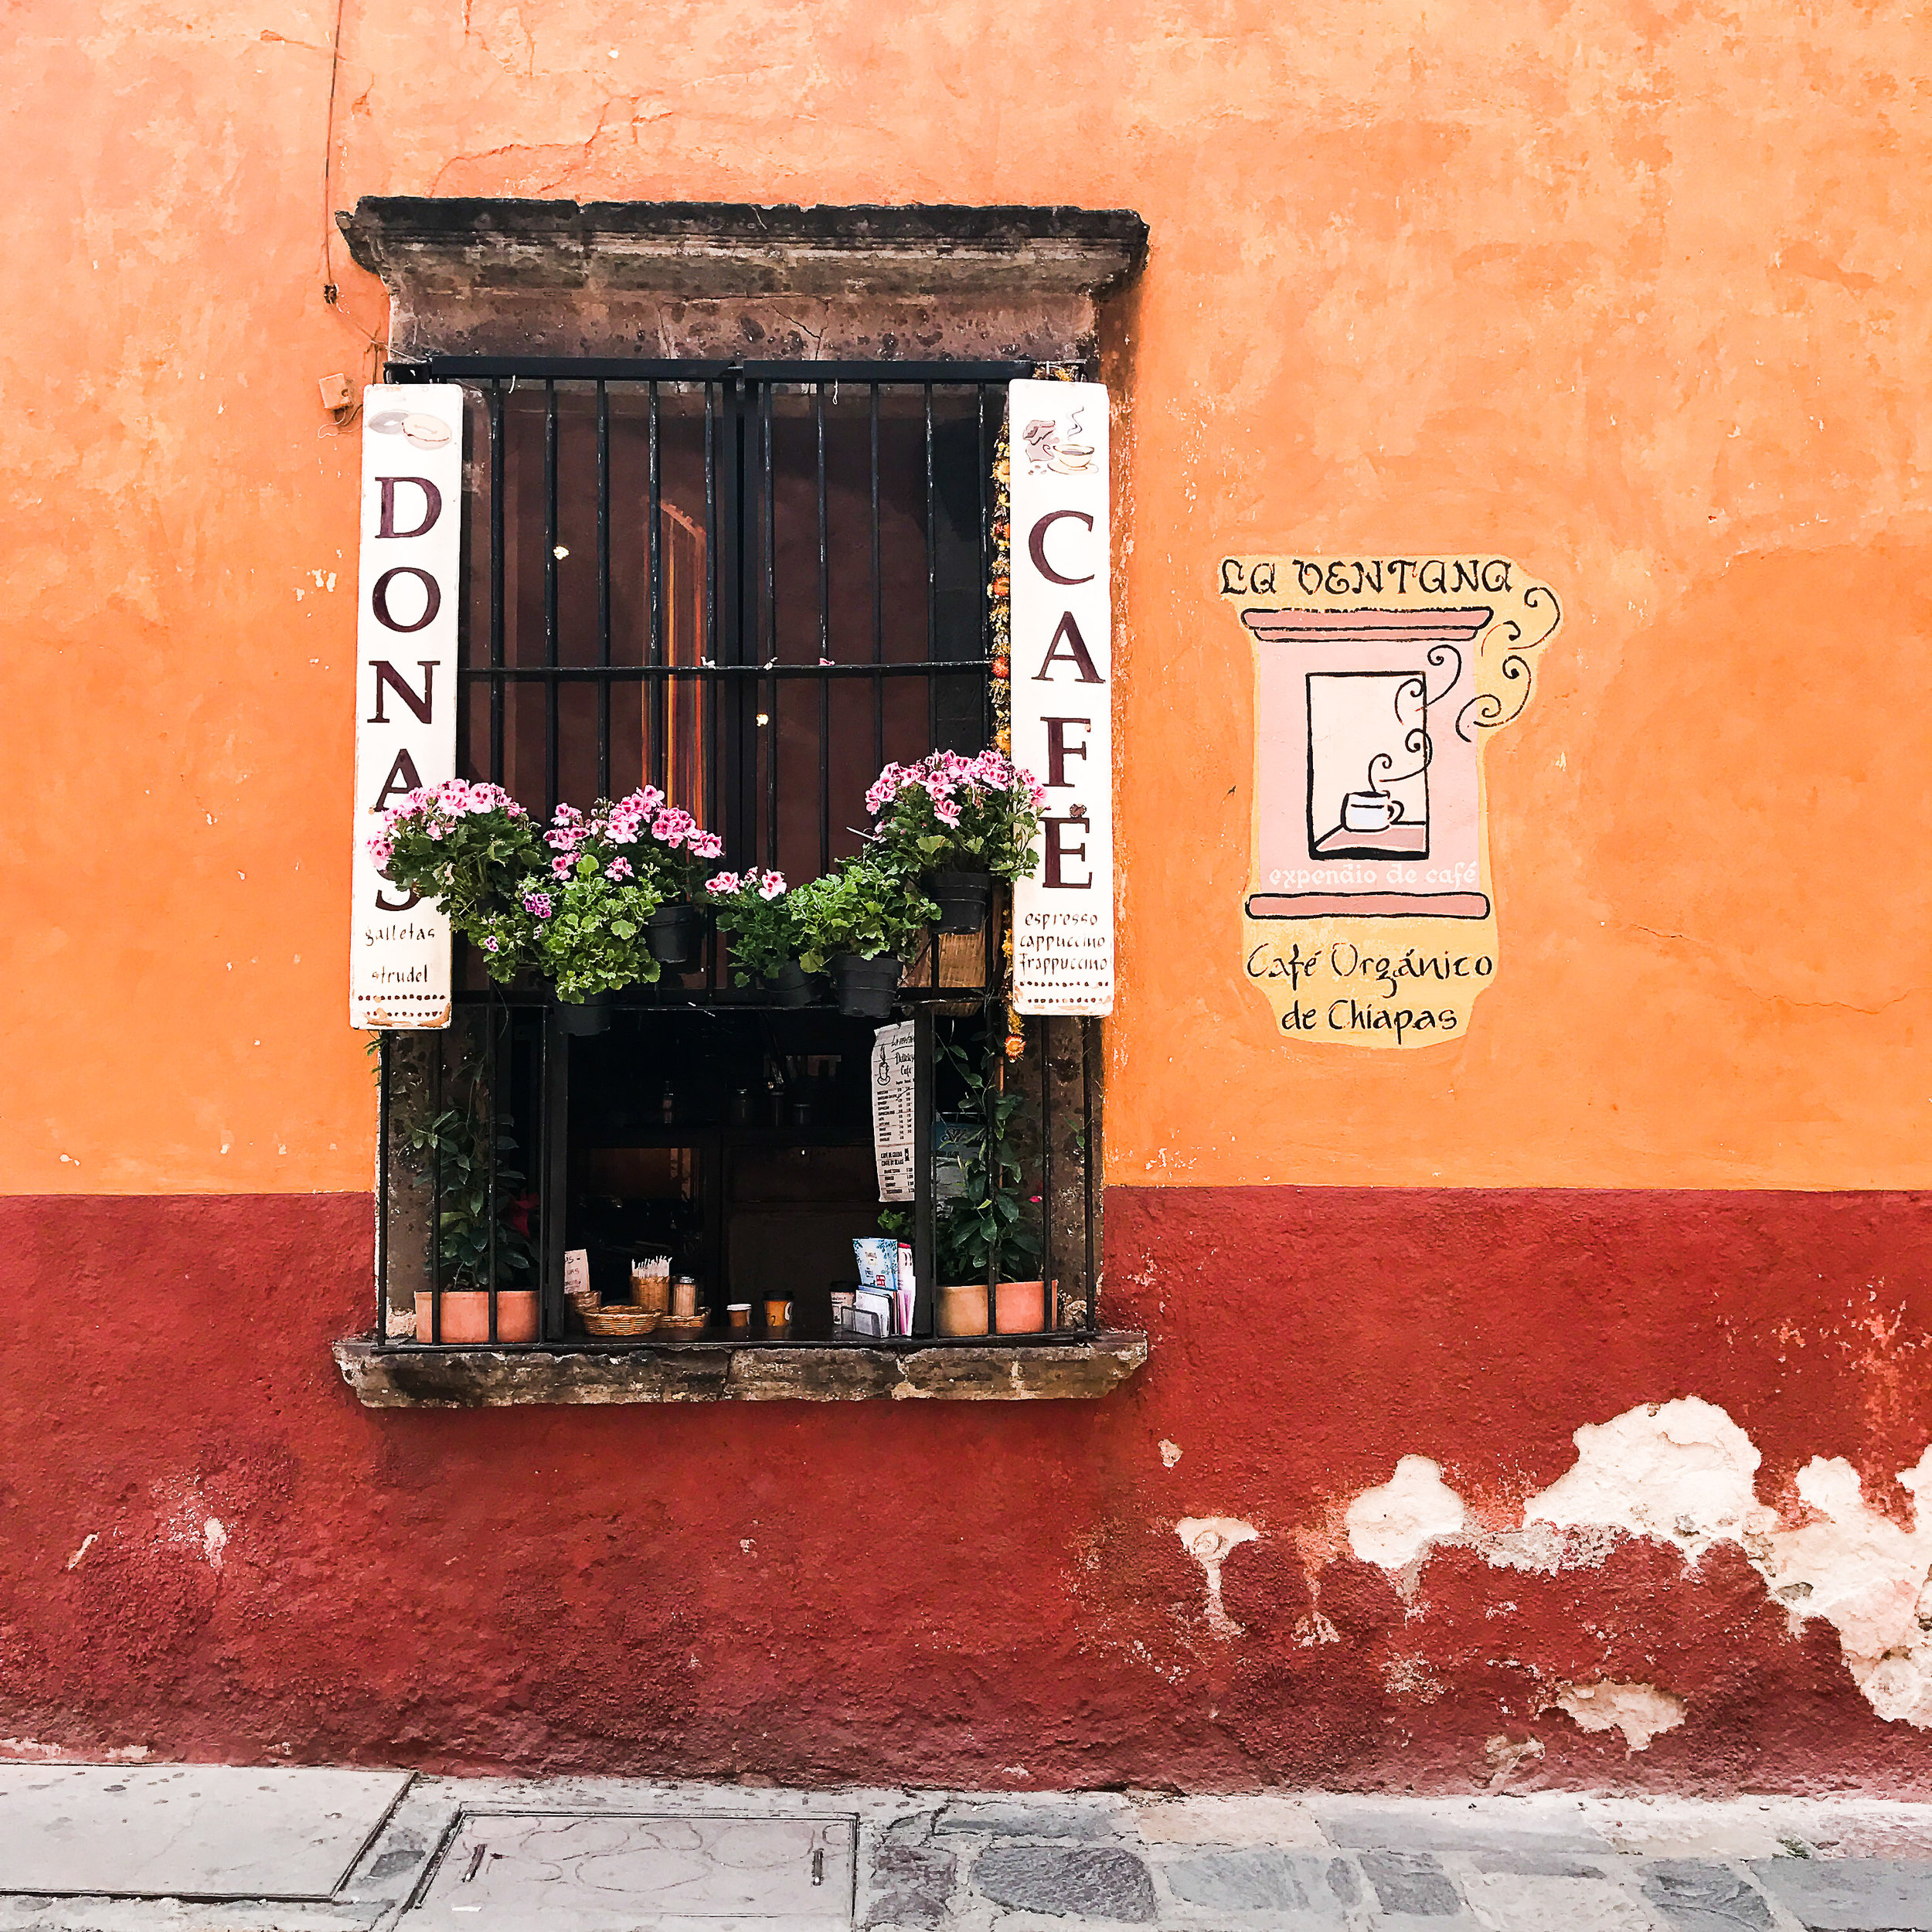 mexican-food-san-miguel-de-allende-restuarants-coffee-cafes-2.jpg